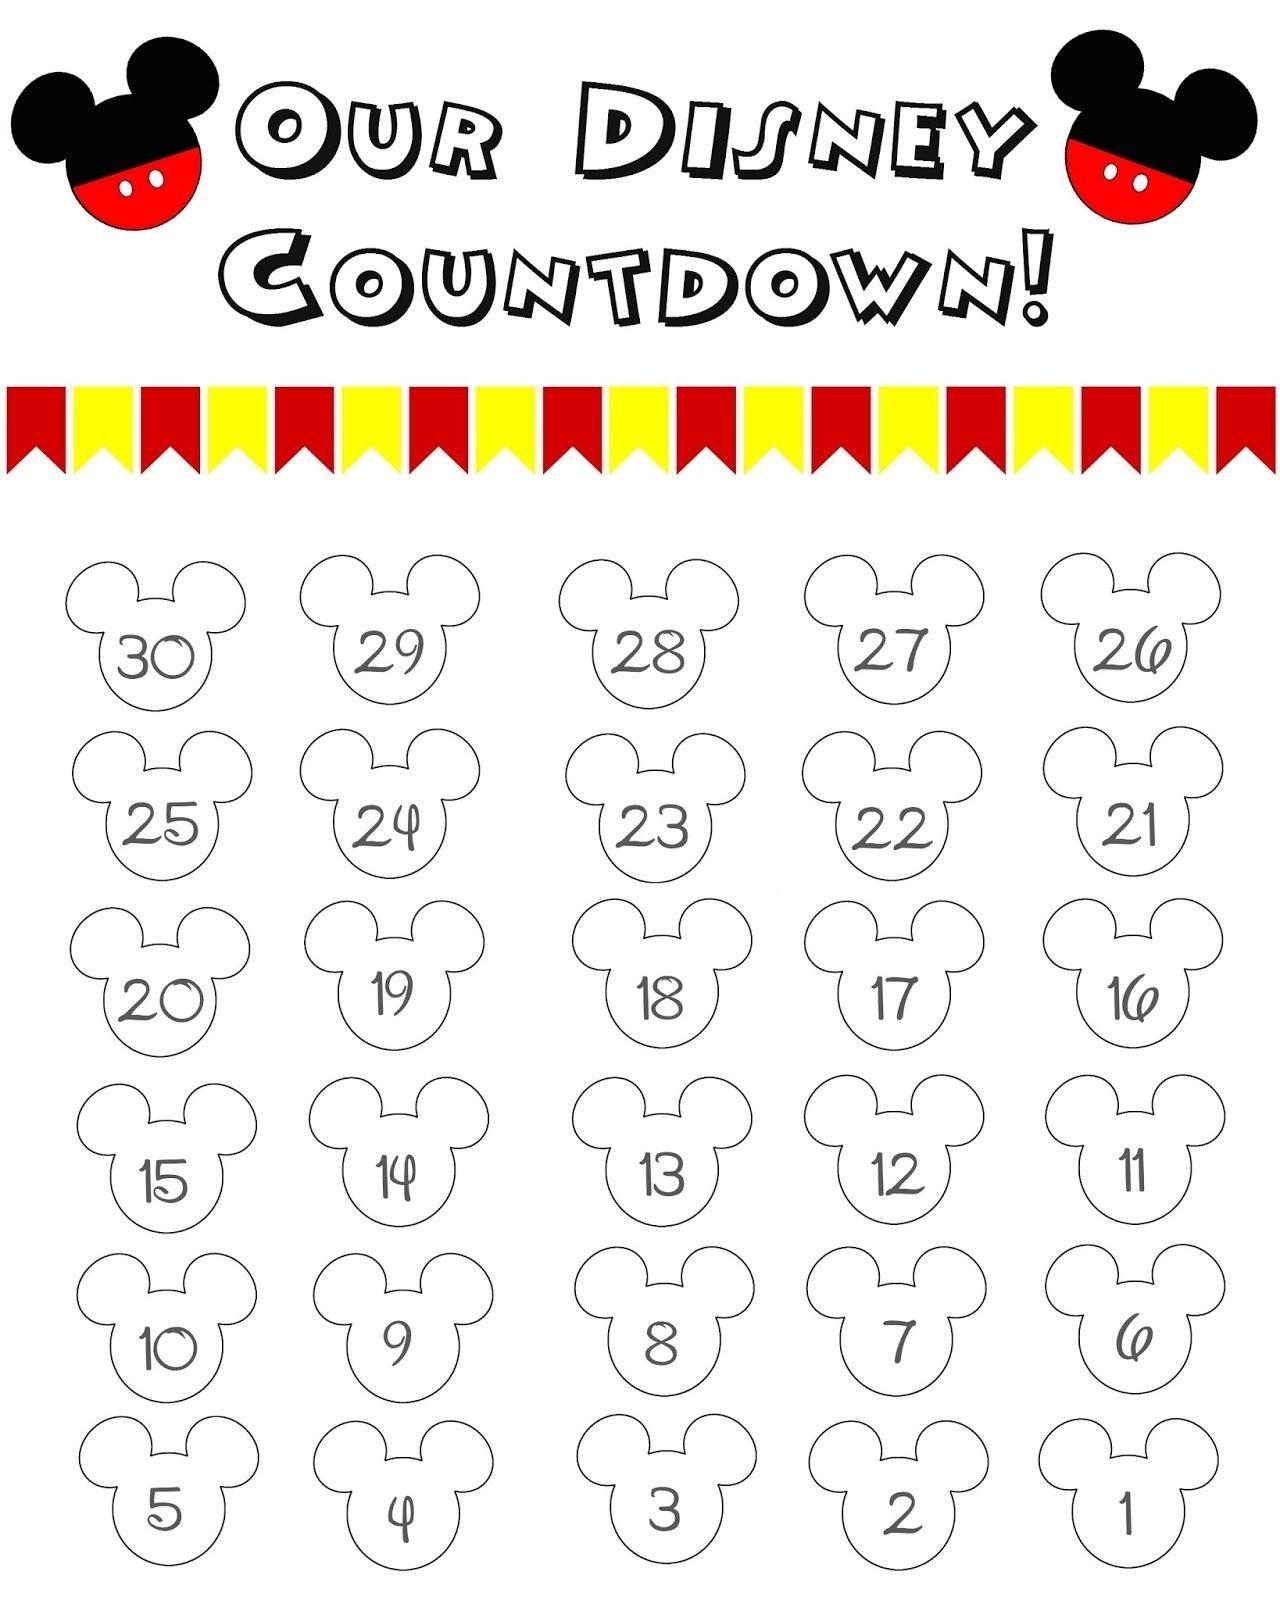 Disney World Countdown Calendar - Free Printable | The Momma-Printable Holiday Countdown Calendar Template